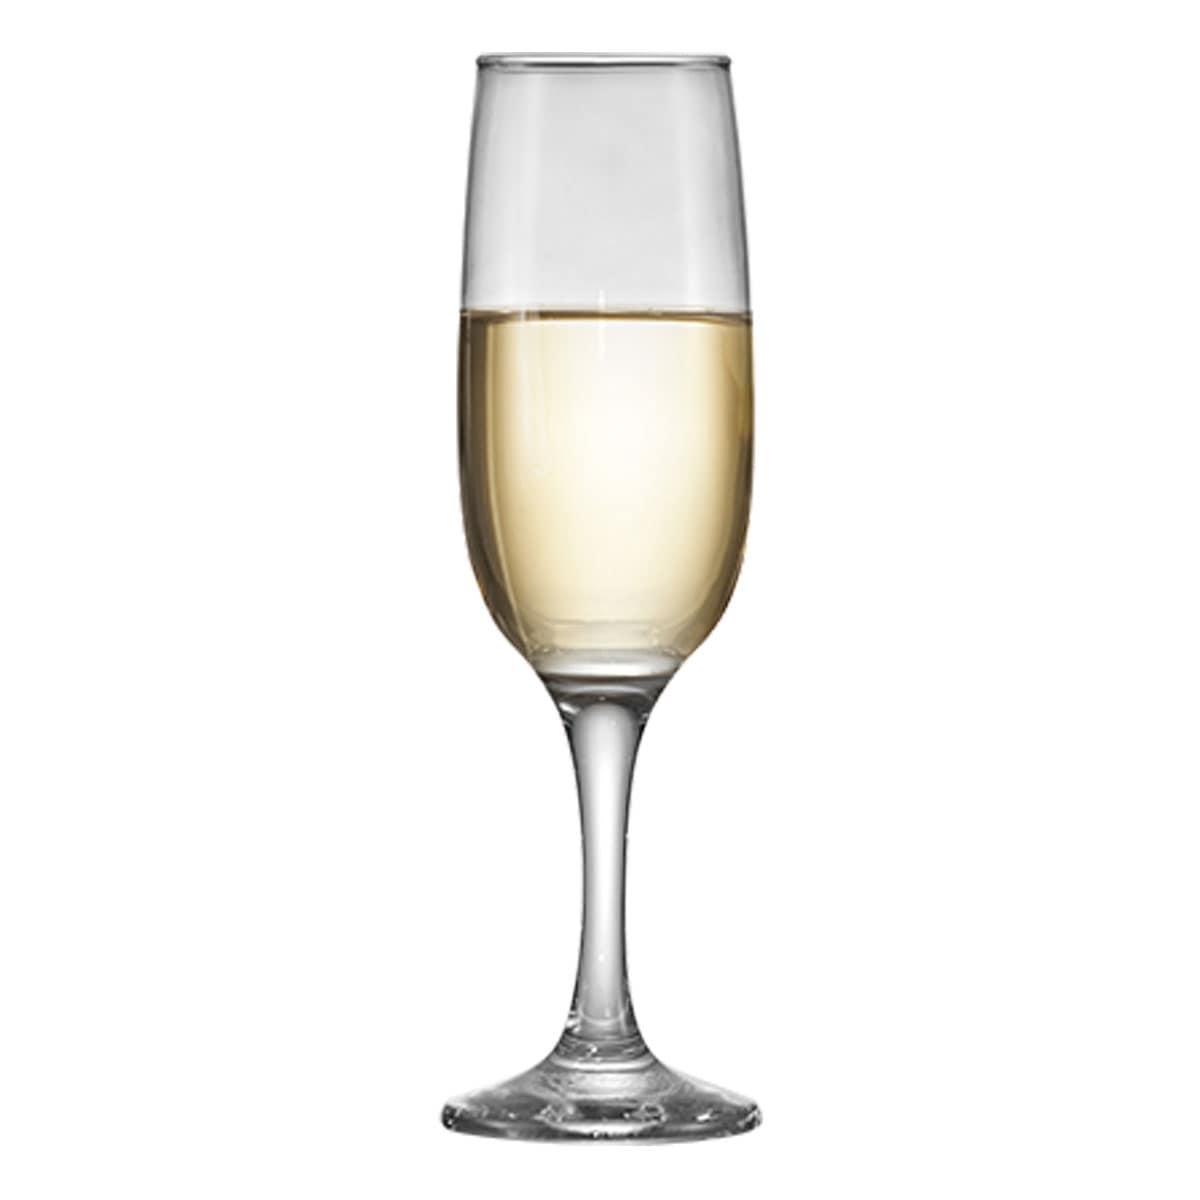 Taça de Vidro Roma Champagne 215ml R$9.33 a unid. (Caixa com 24 unidades)